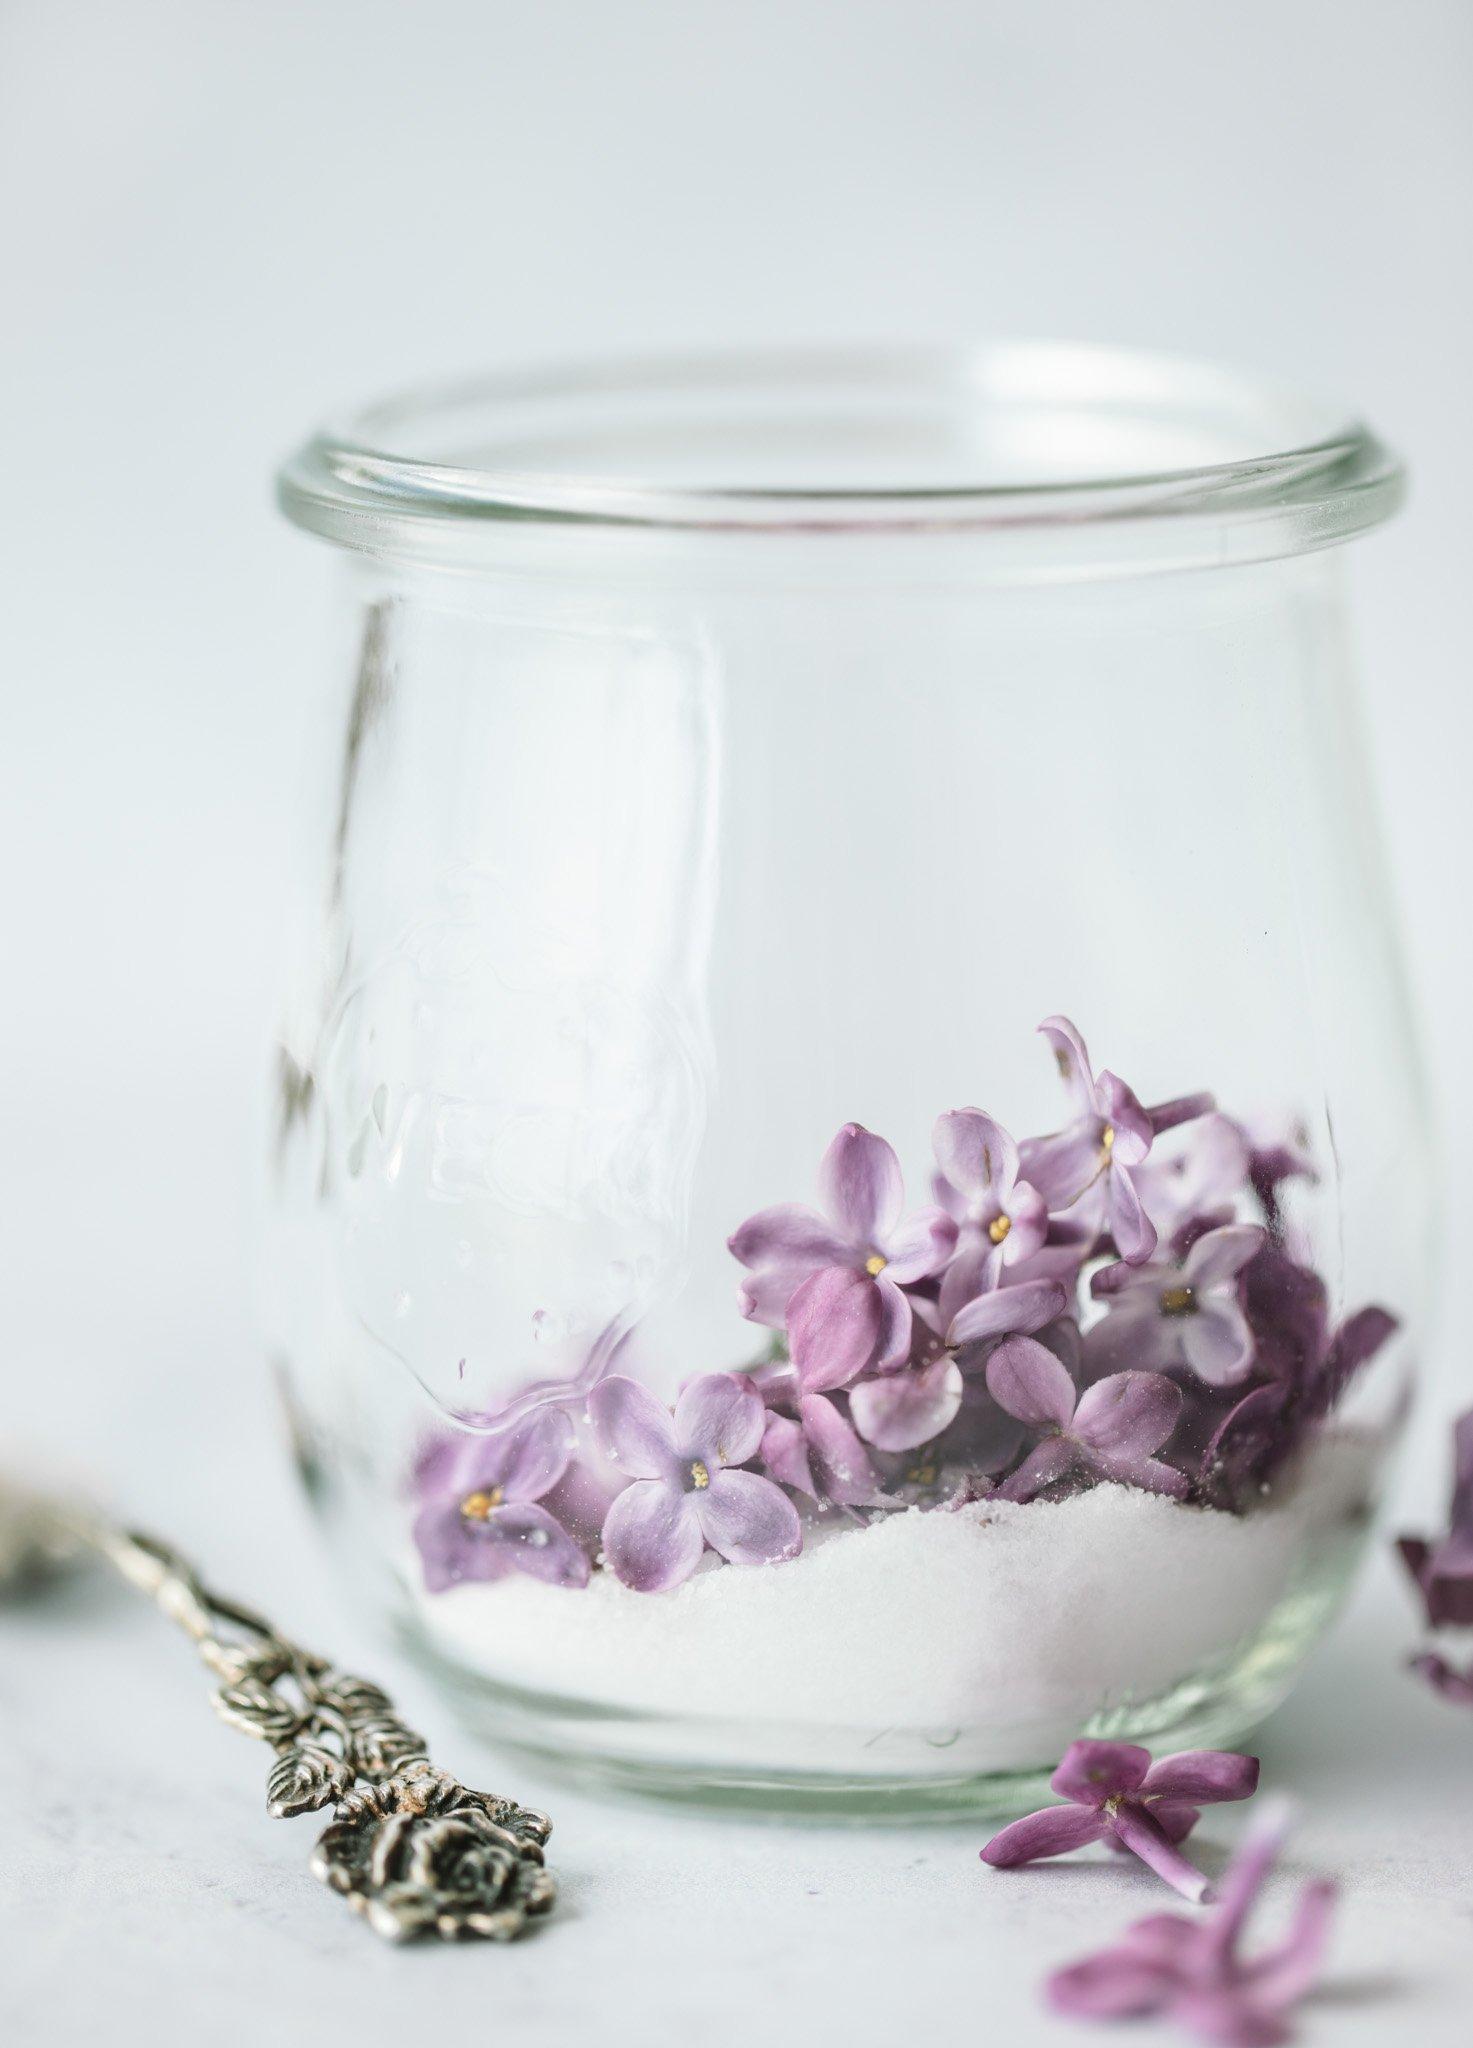 How to Make Lilac Sugar